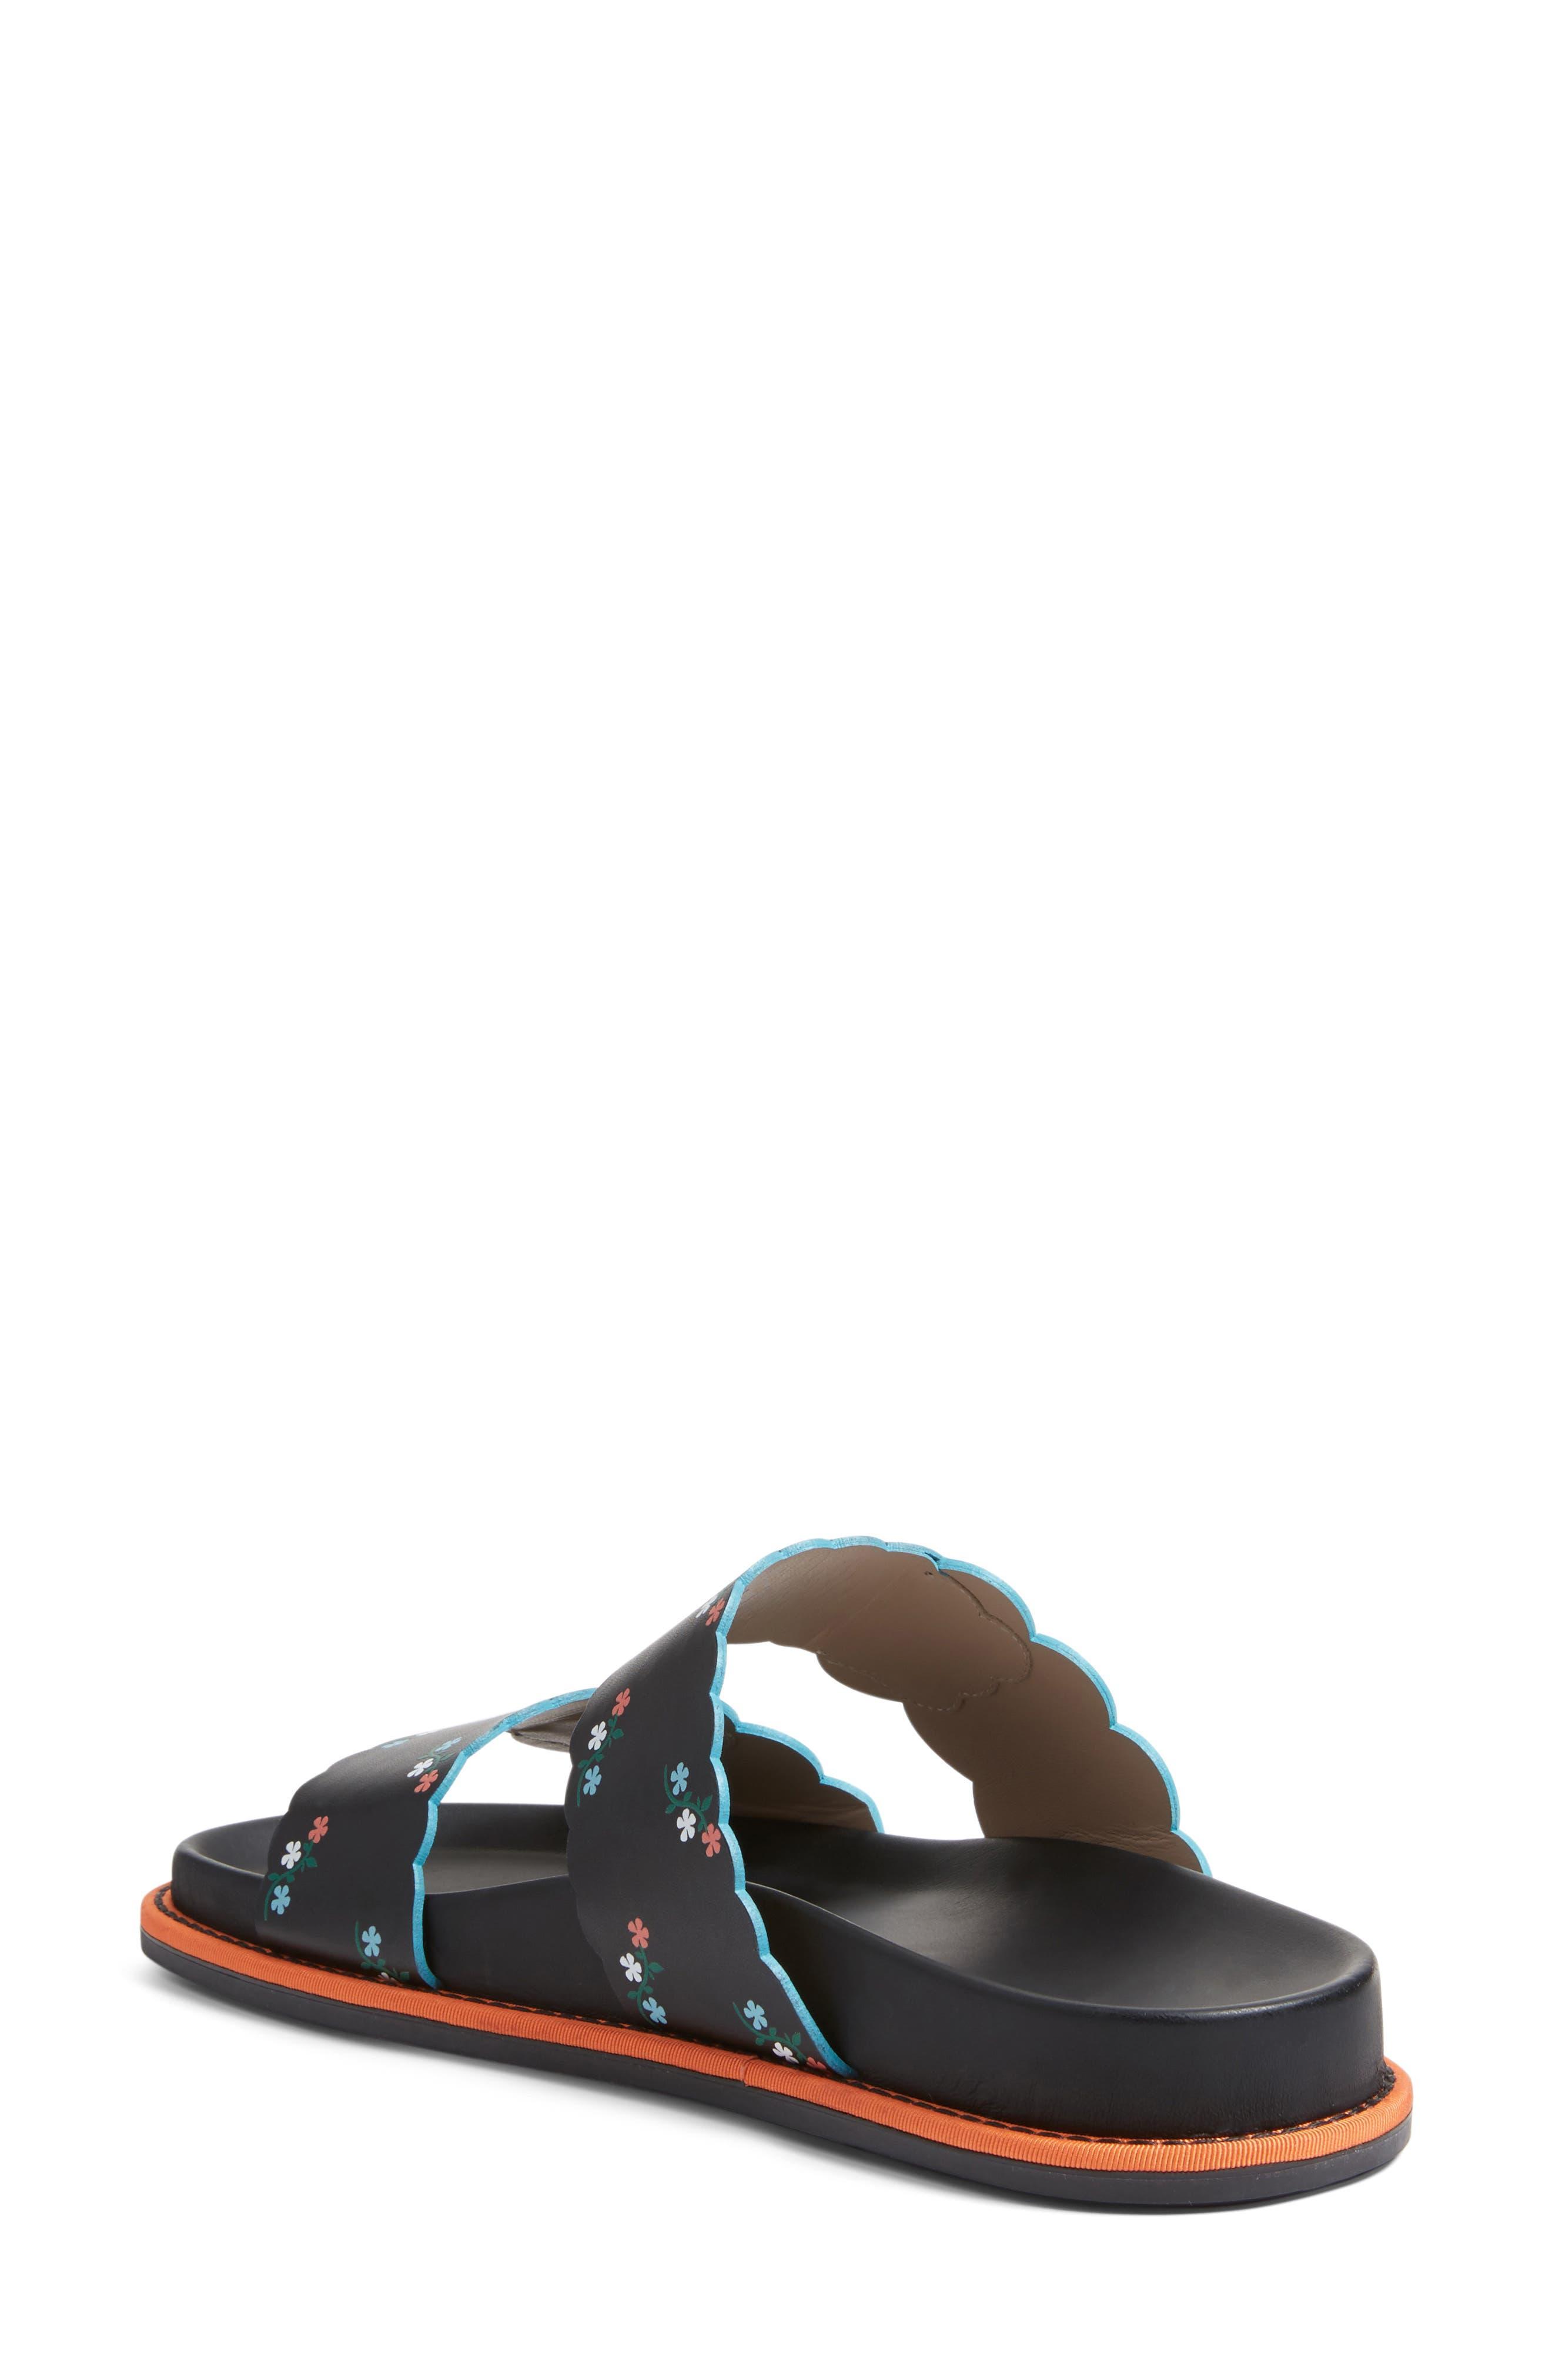 Scallop Slide Sandal,                             Alternate thumbnail 2, color,                             Black Floral